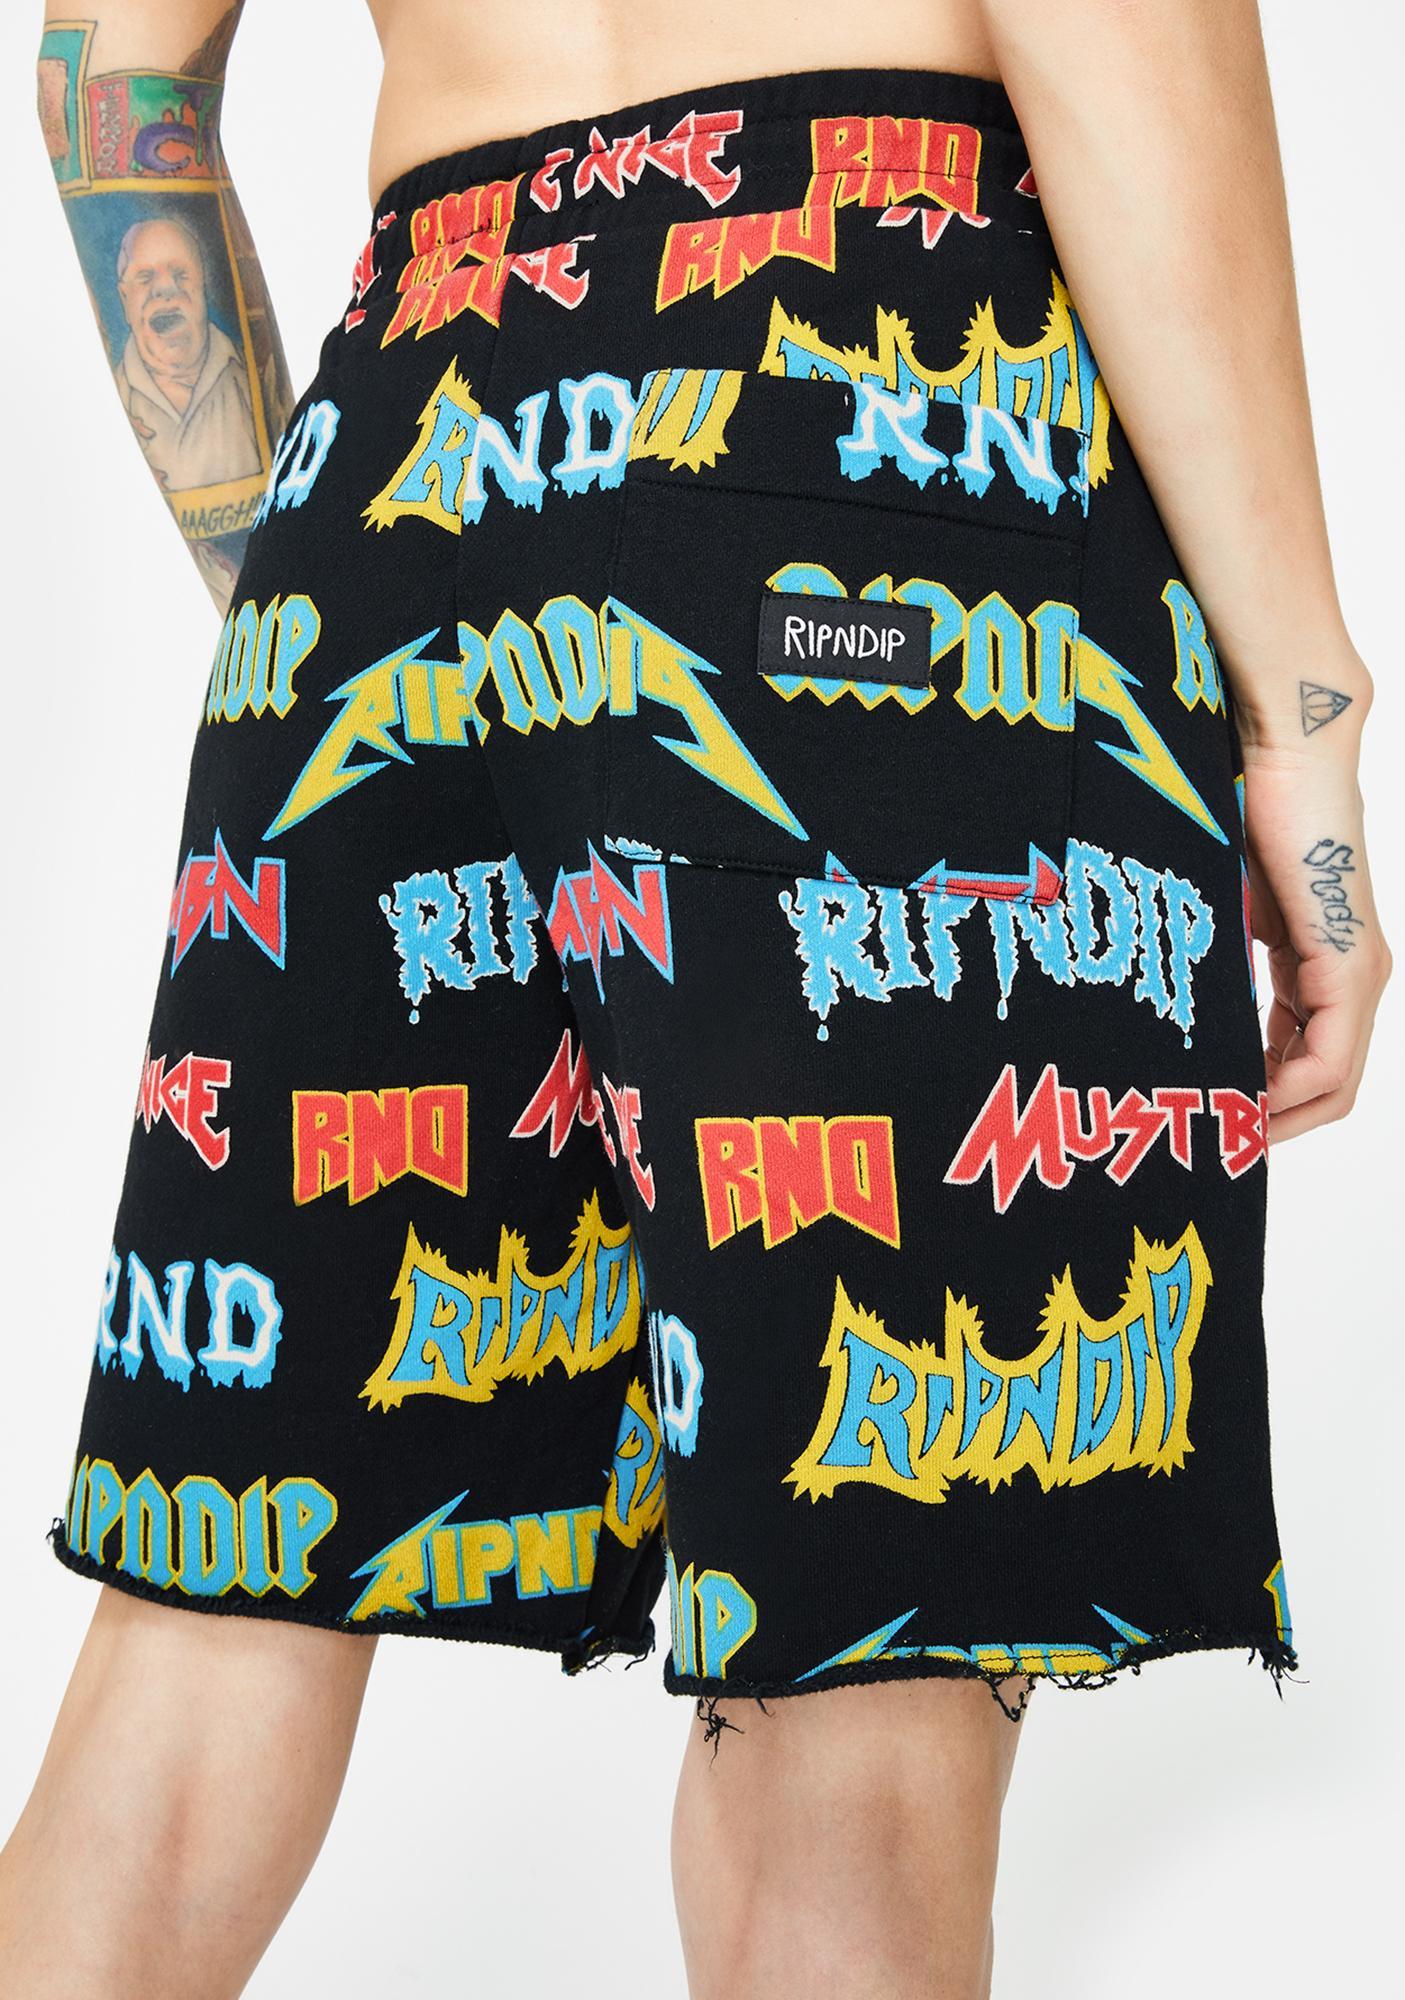 RIPNDIP Rock N' Nerm Sweat Shorts